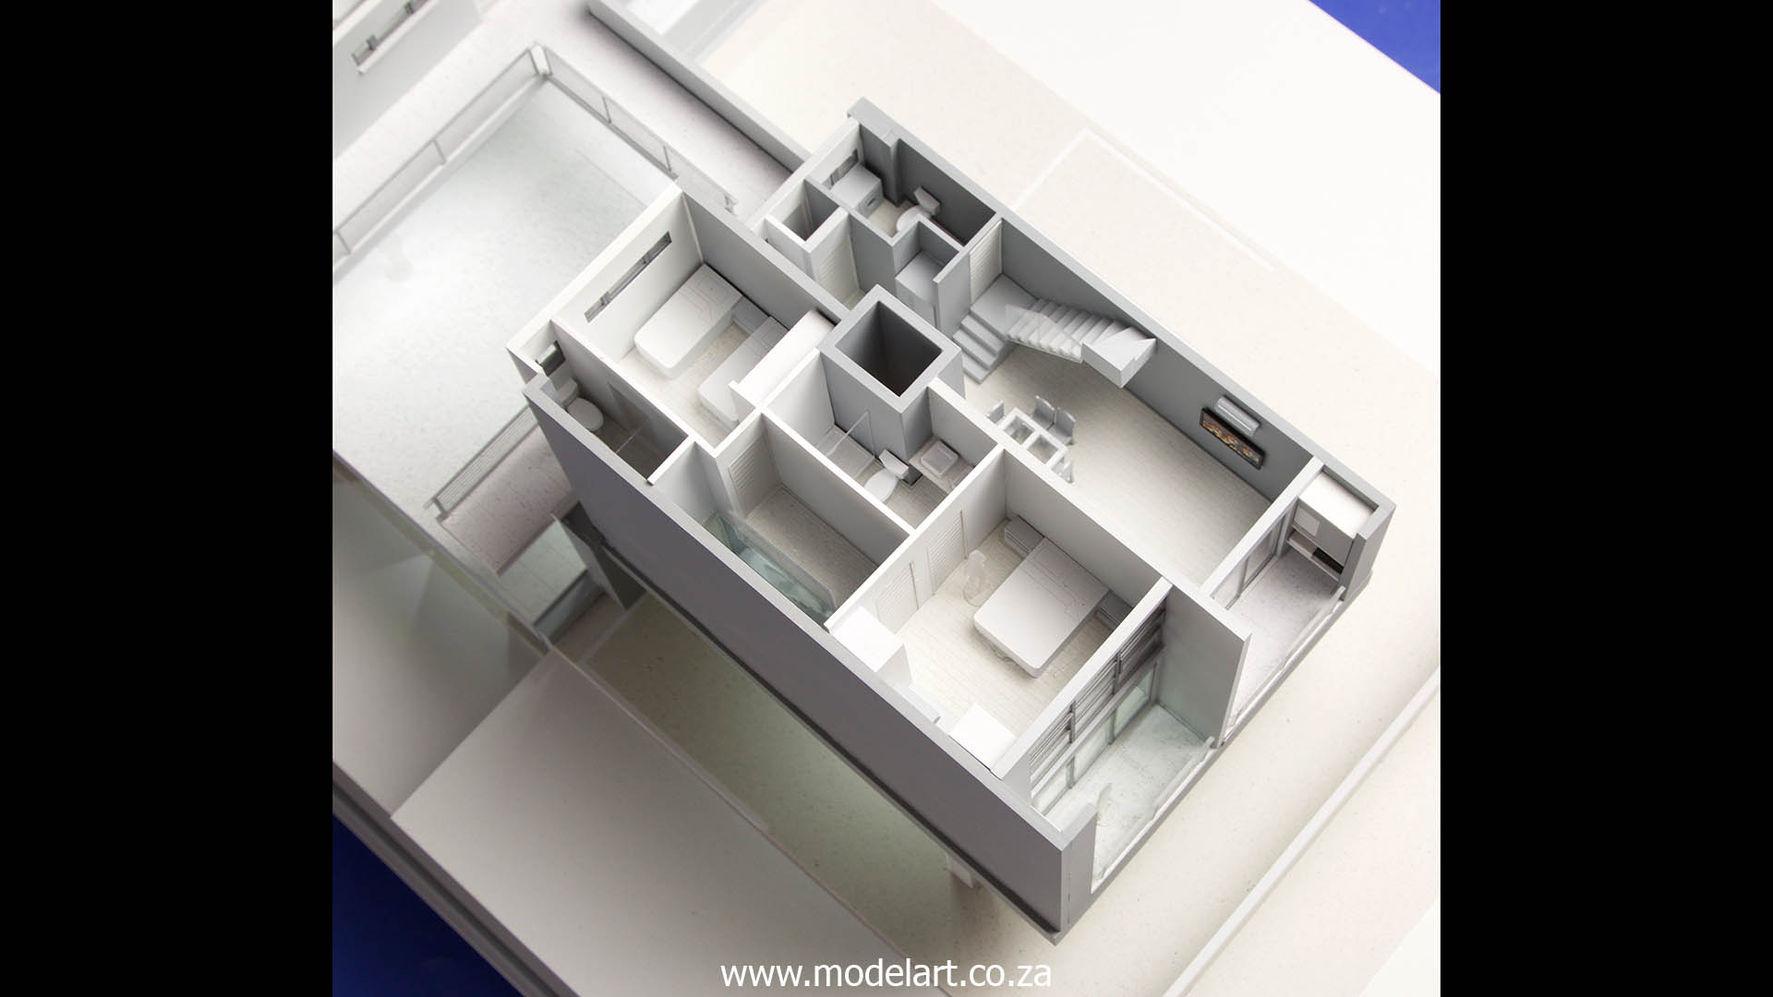 Modelart-Architectural-Scale-Model-Resid